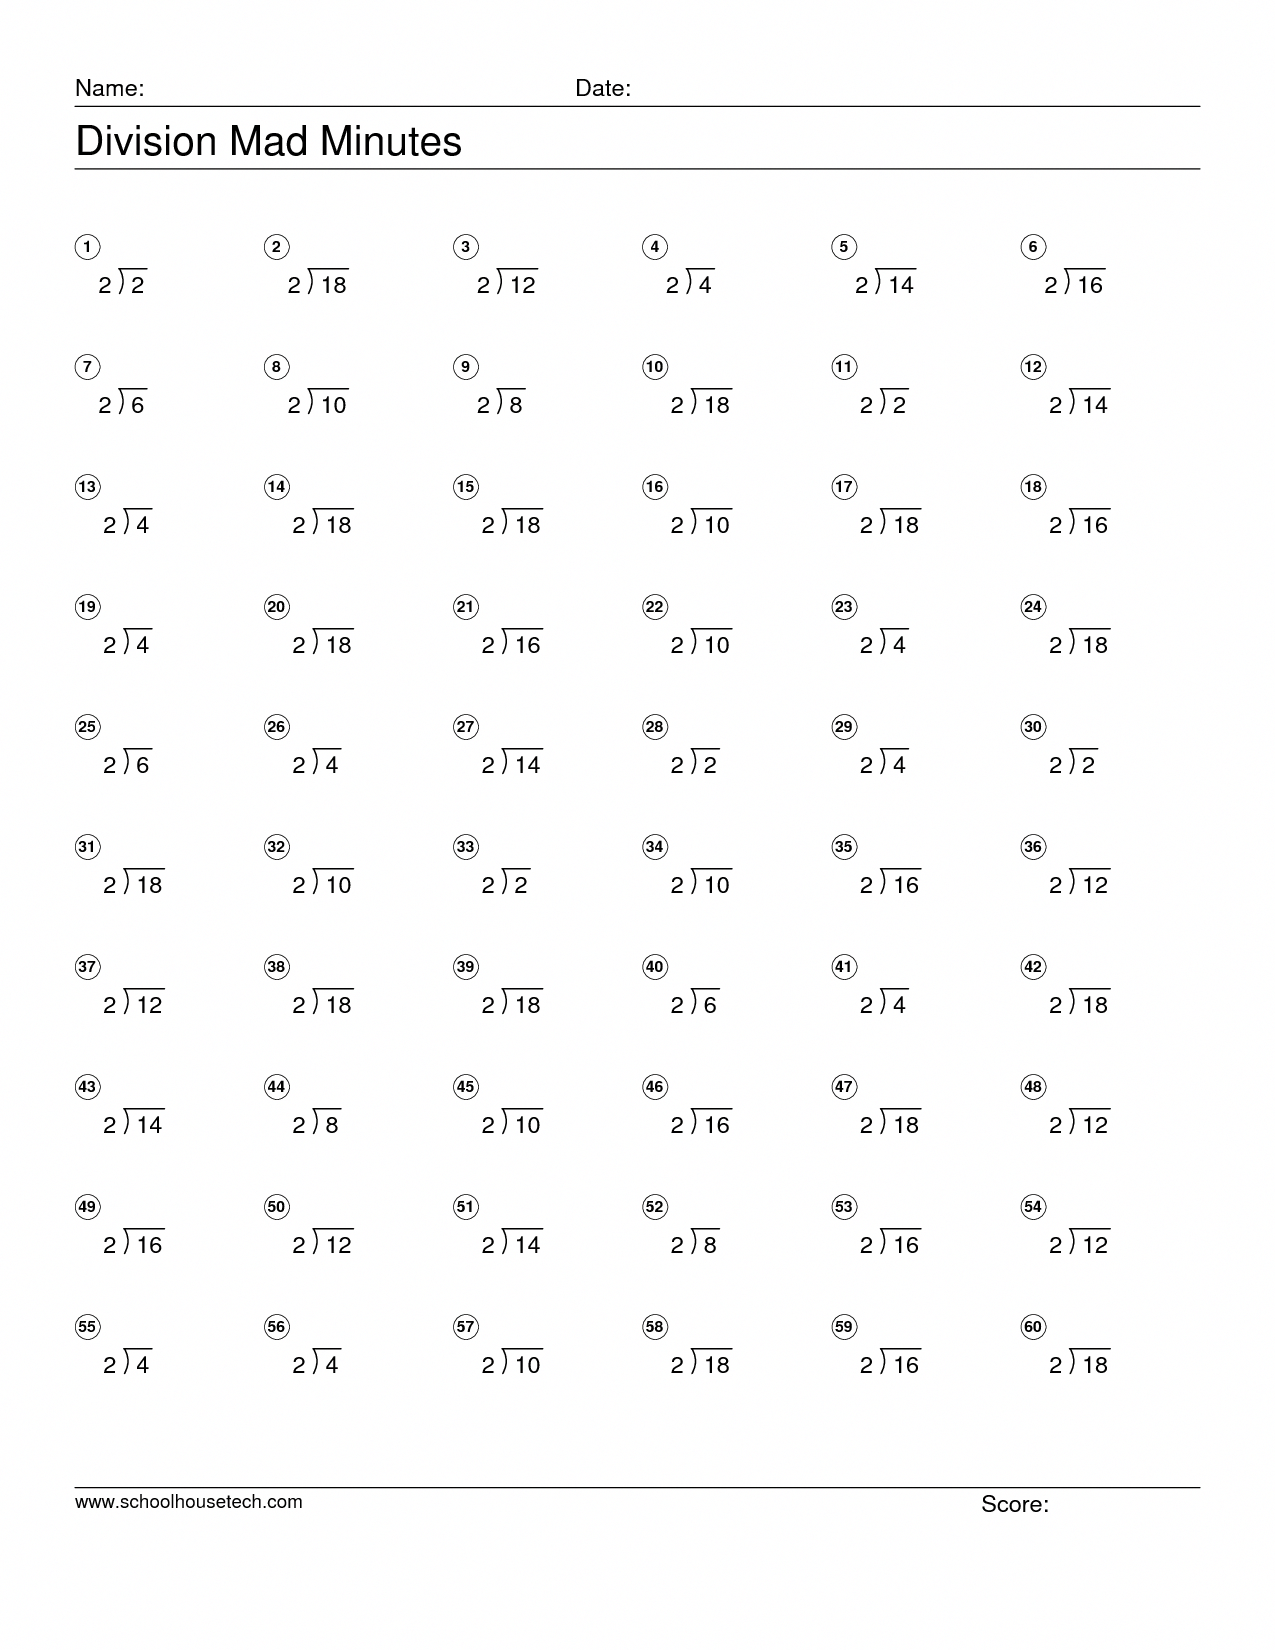 Homeschool Calendar Board Track 3d Printer Diy Life Referral 7157062069 4th Grade Math Worksheets Math Multiplication Worksheets Division Worksheets [ 1650 x 1275 Pixel ]